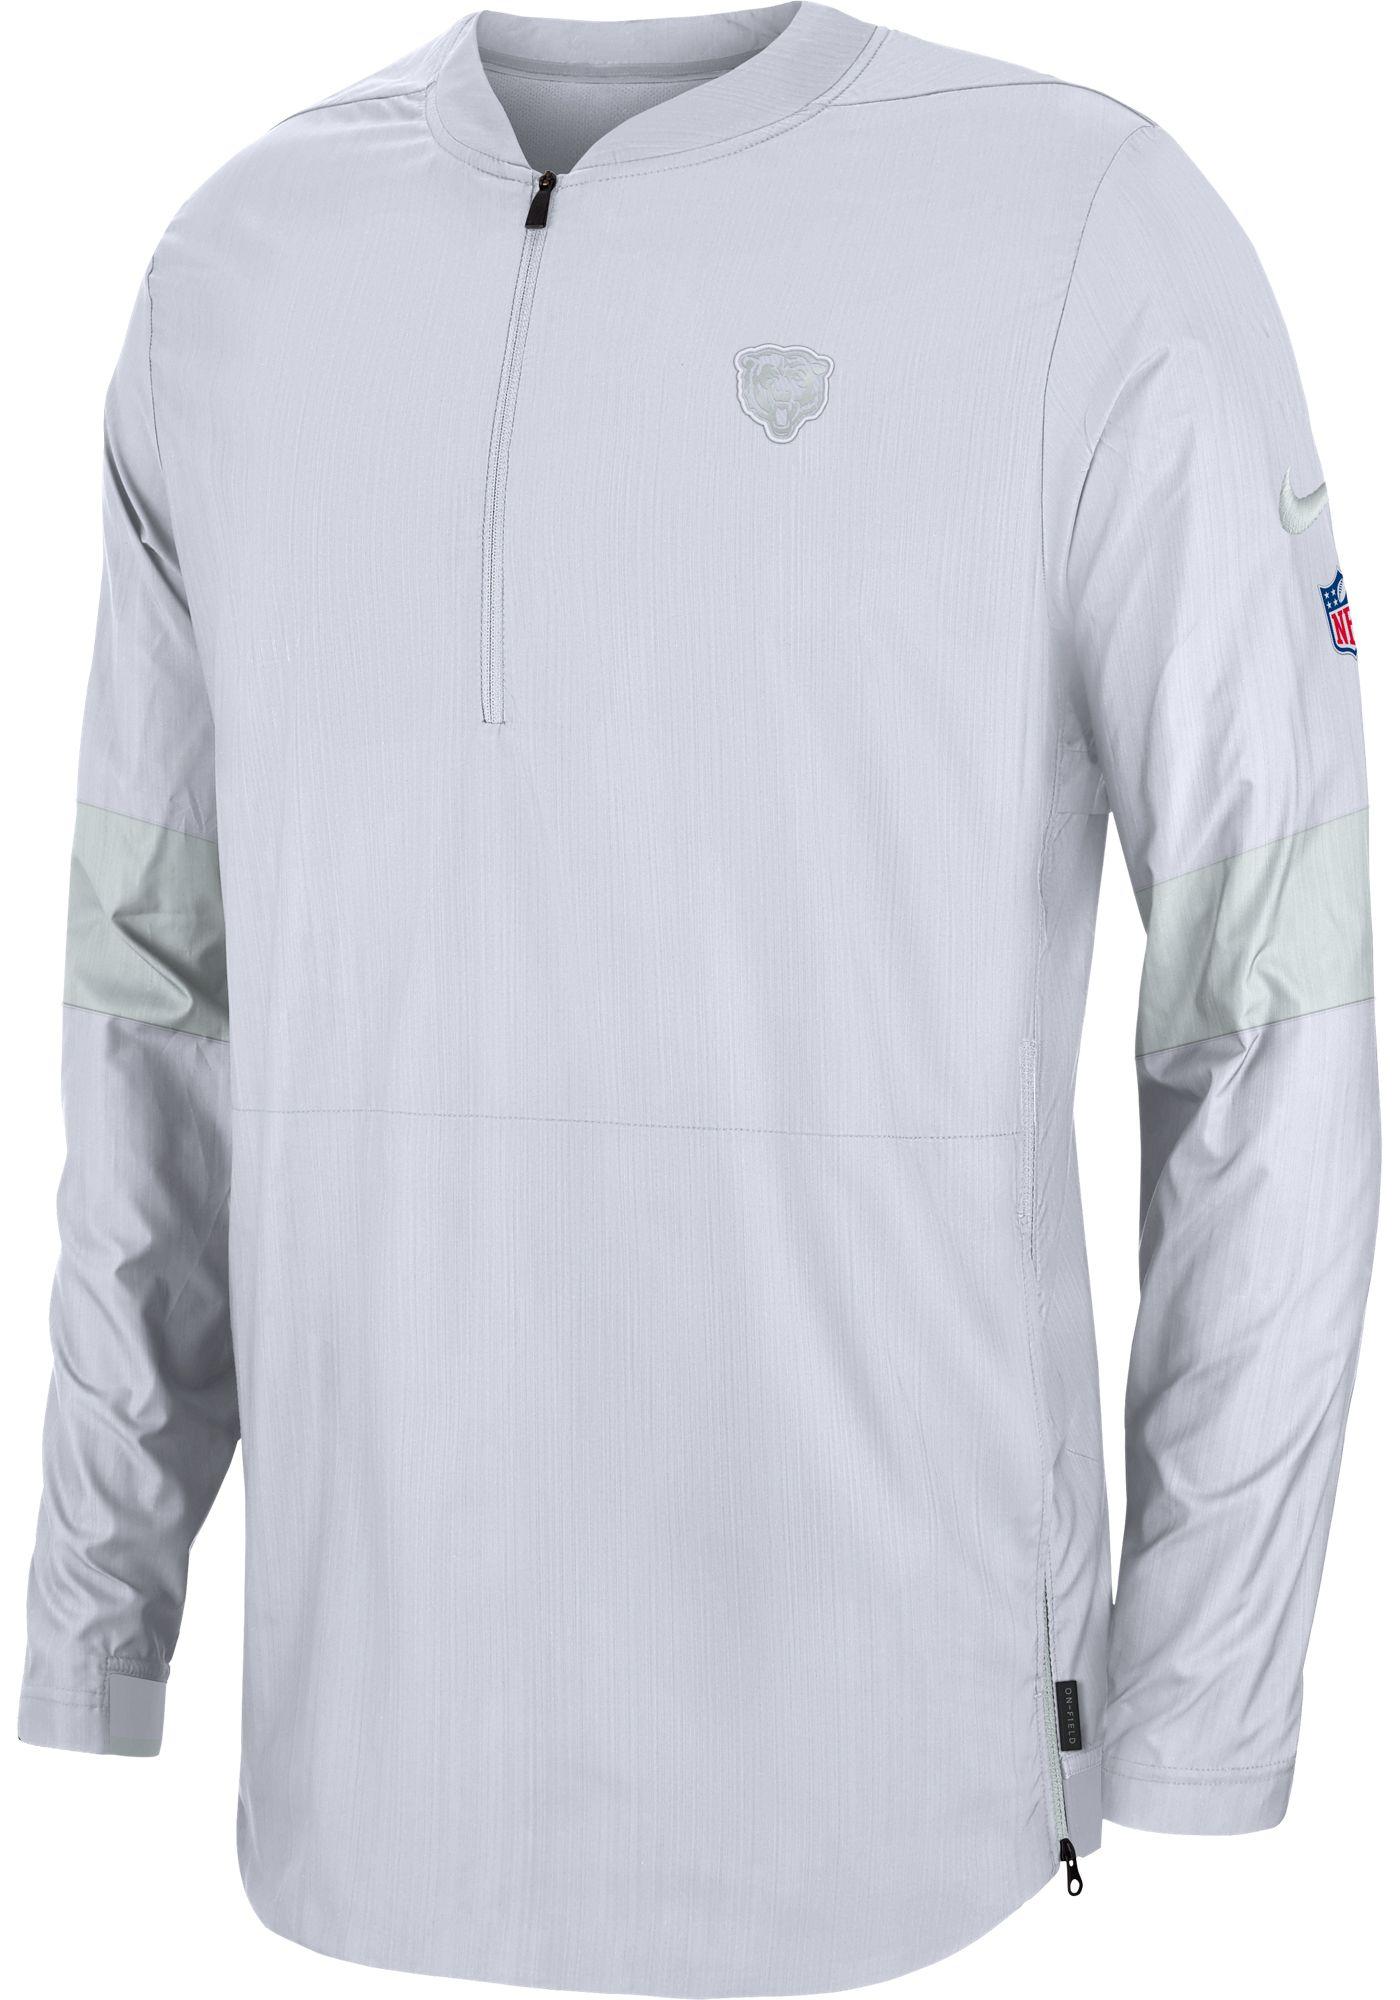 Nike Men's Chicago Bears Sideline Coach White Half-Zip Performance Jacket